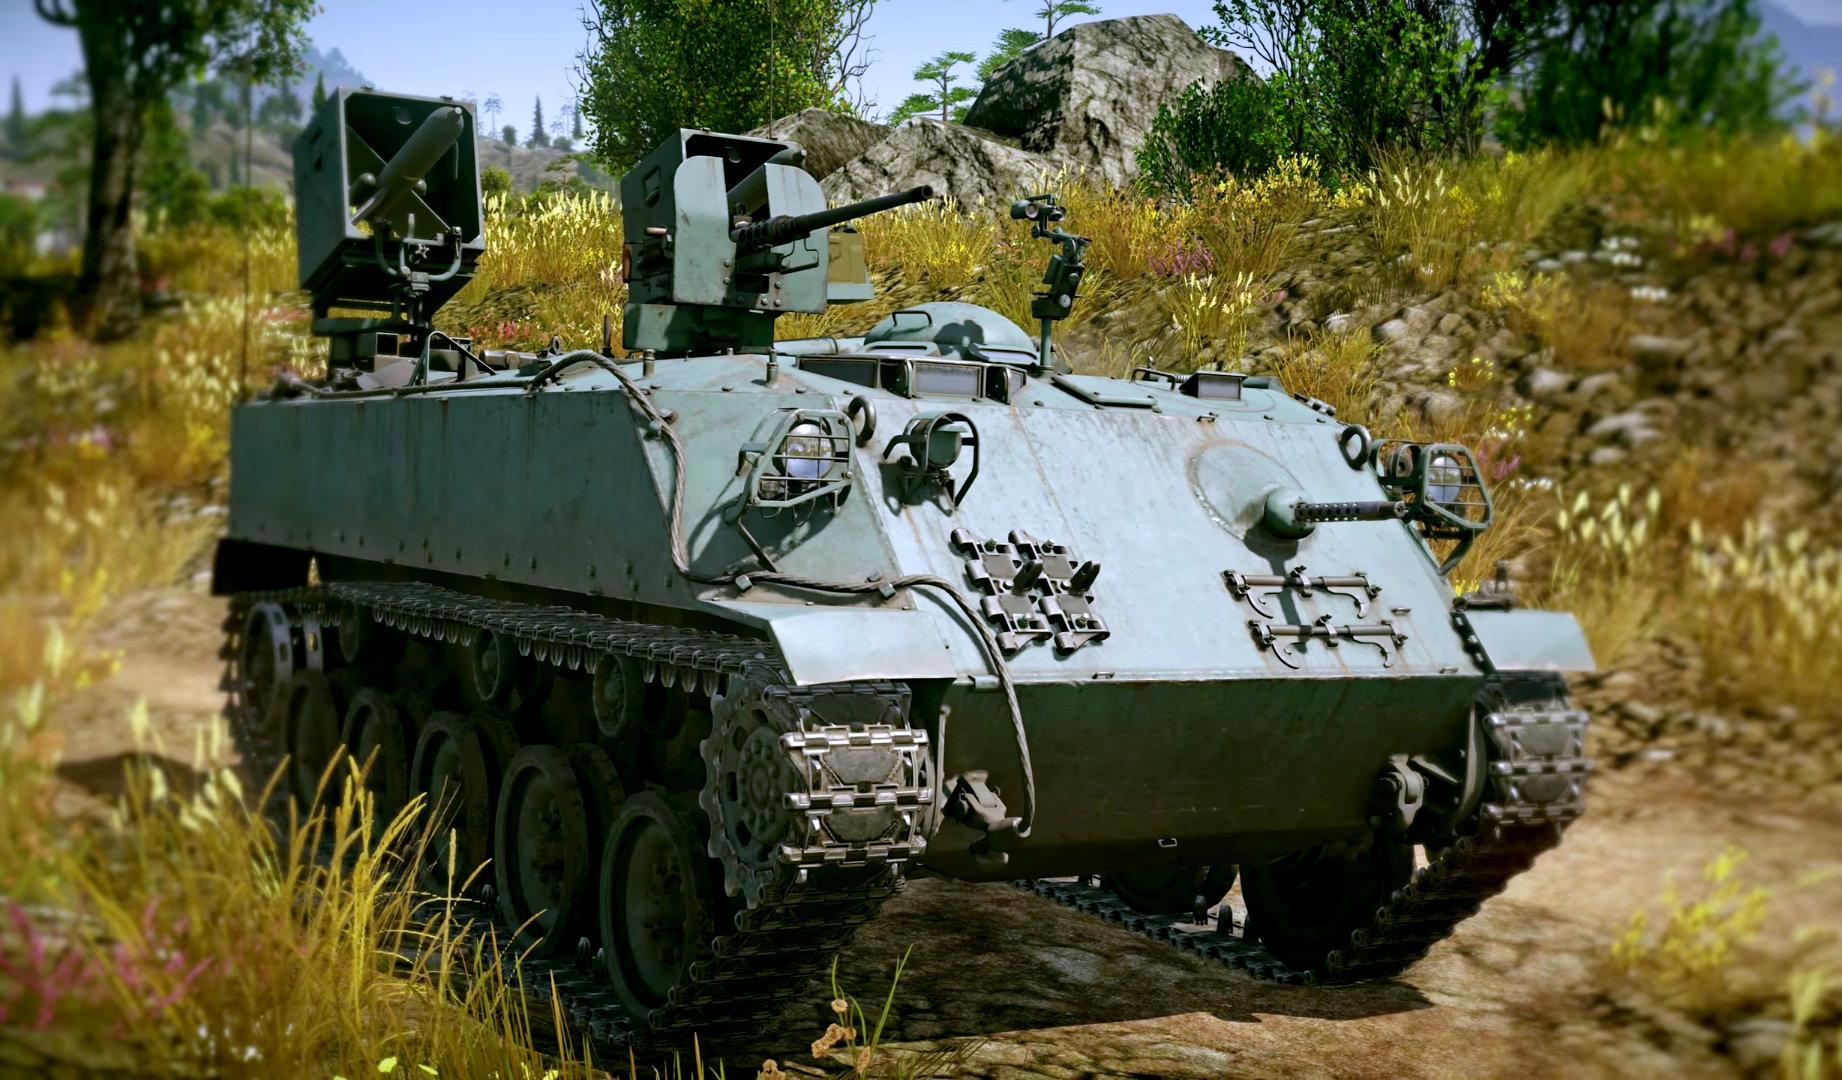 http://armor.kiev.ua/Tanks/Modern/type60apc/type60apc_mat_3.jpg